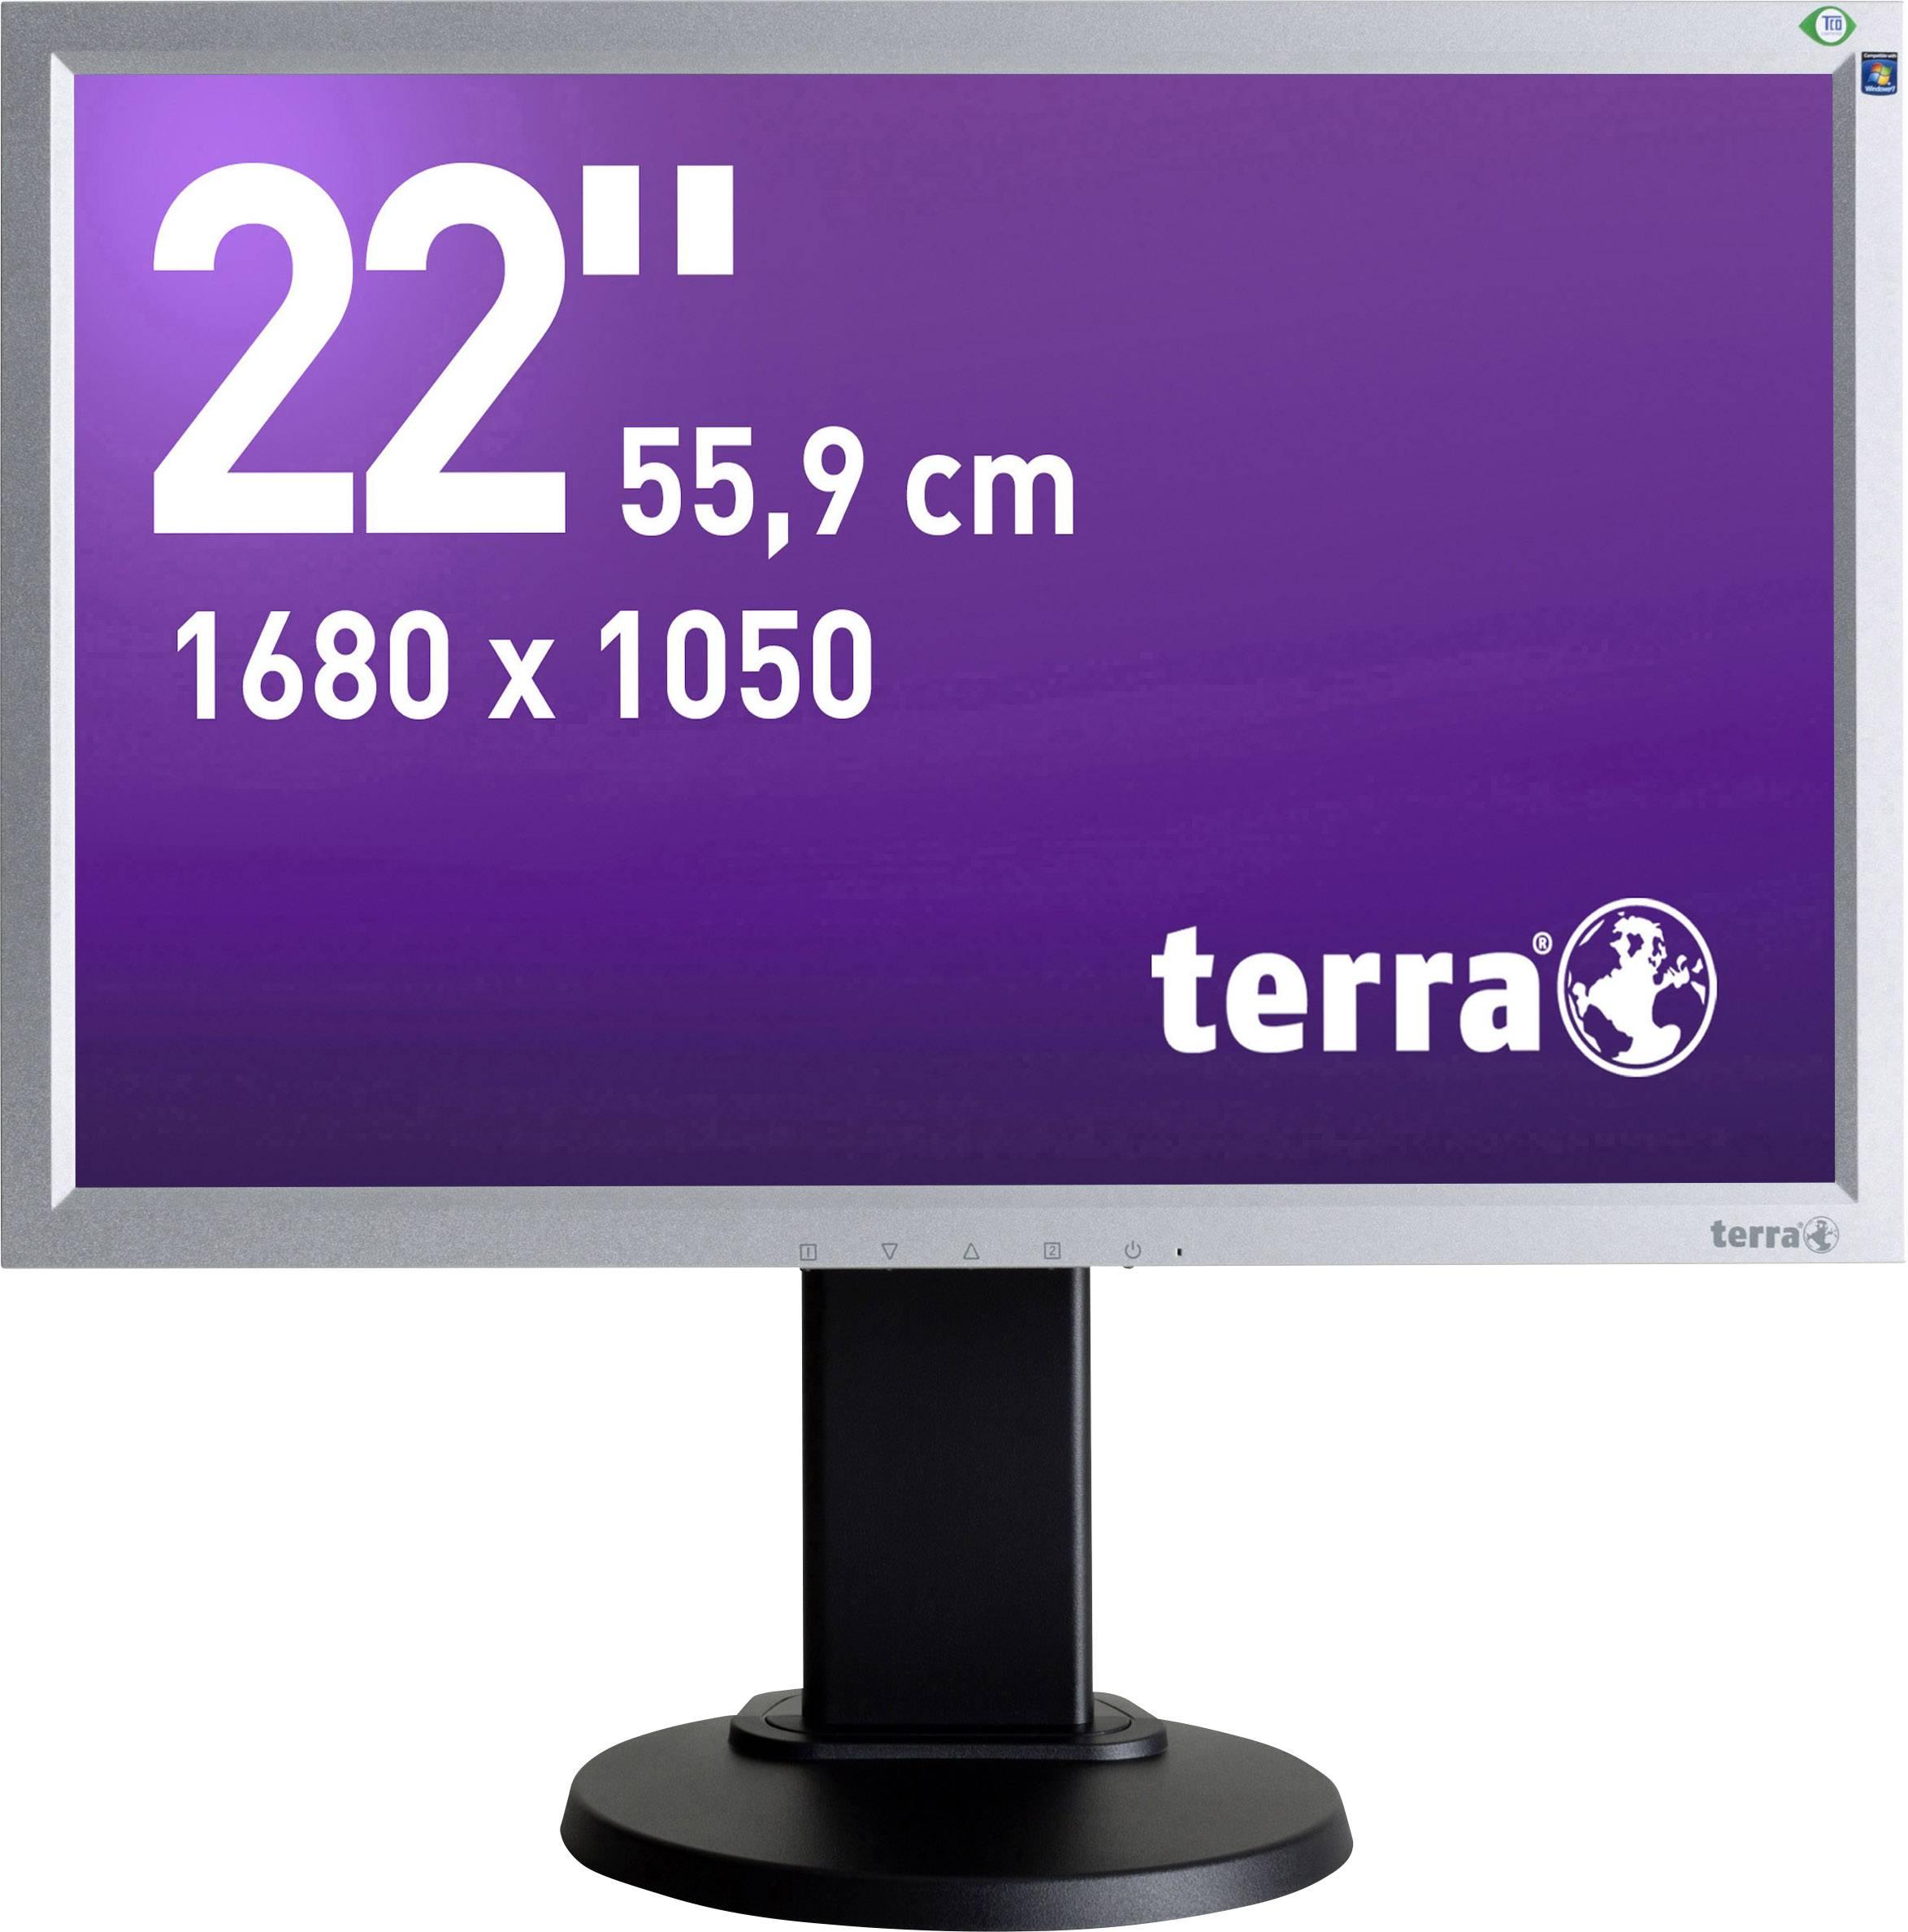 Terra LED 2230W PV Monitor LED